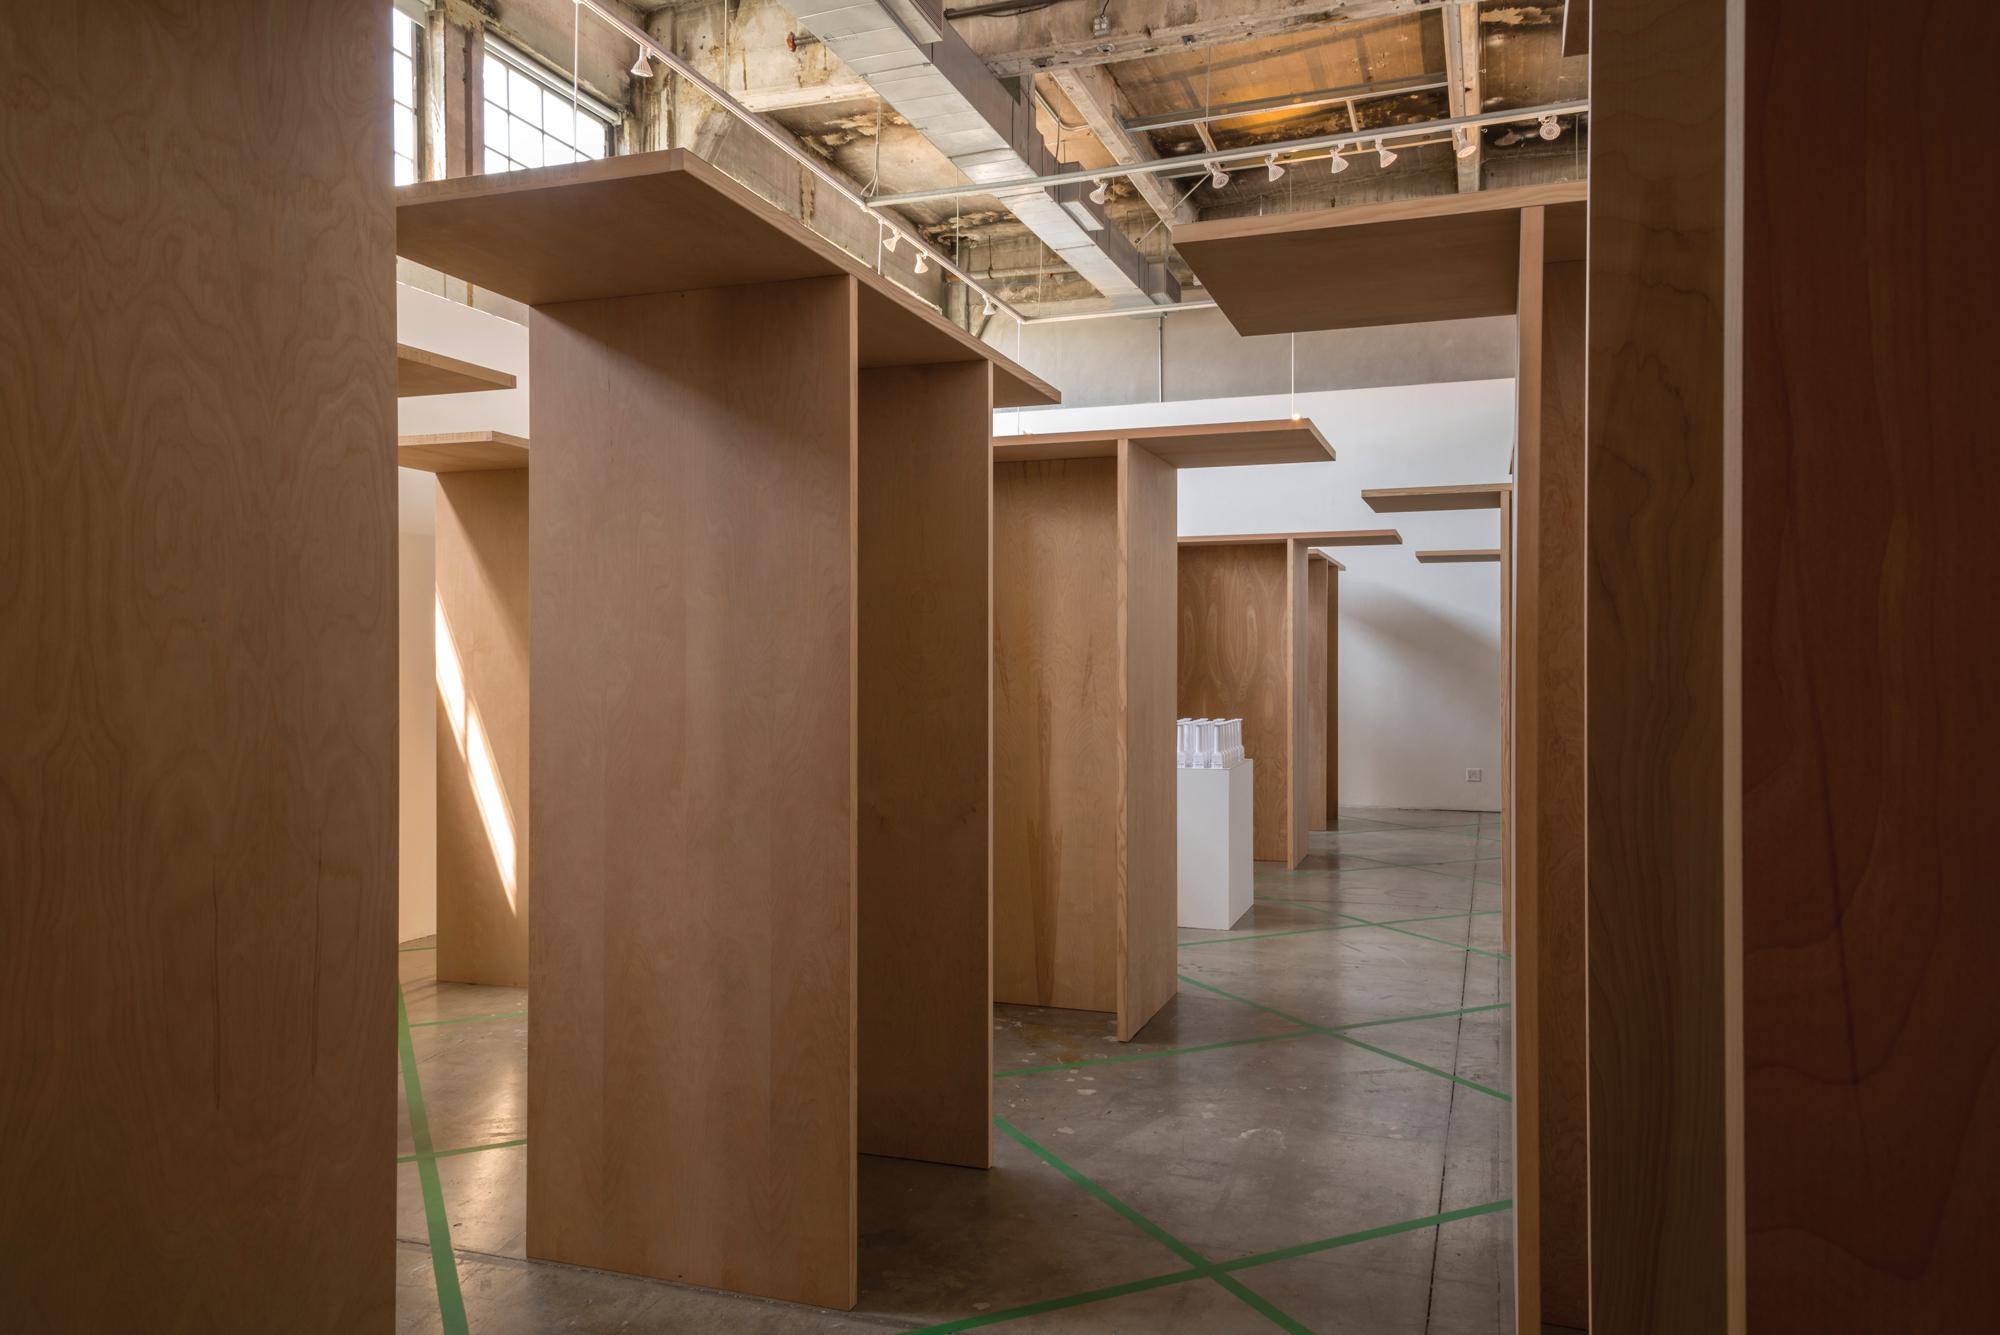 wooden structures in art exhibition